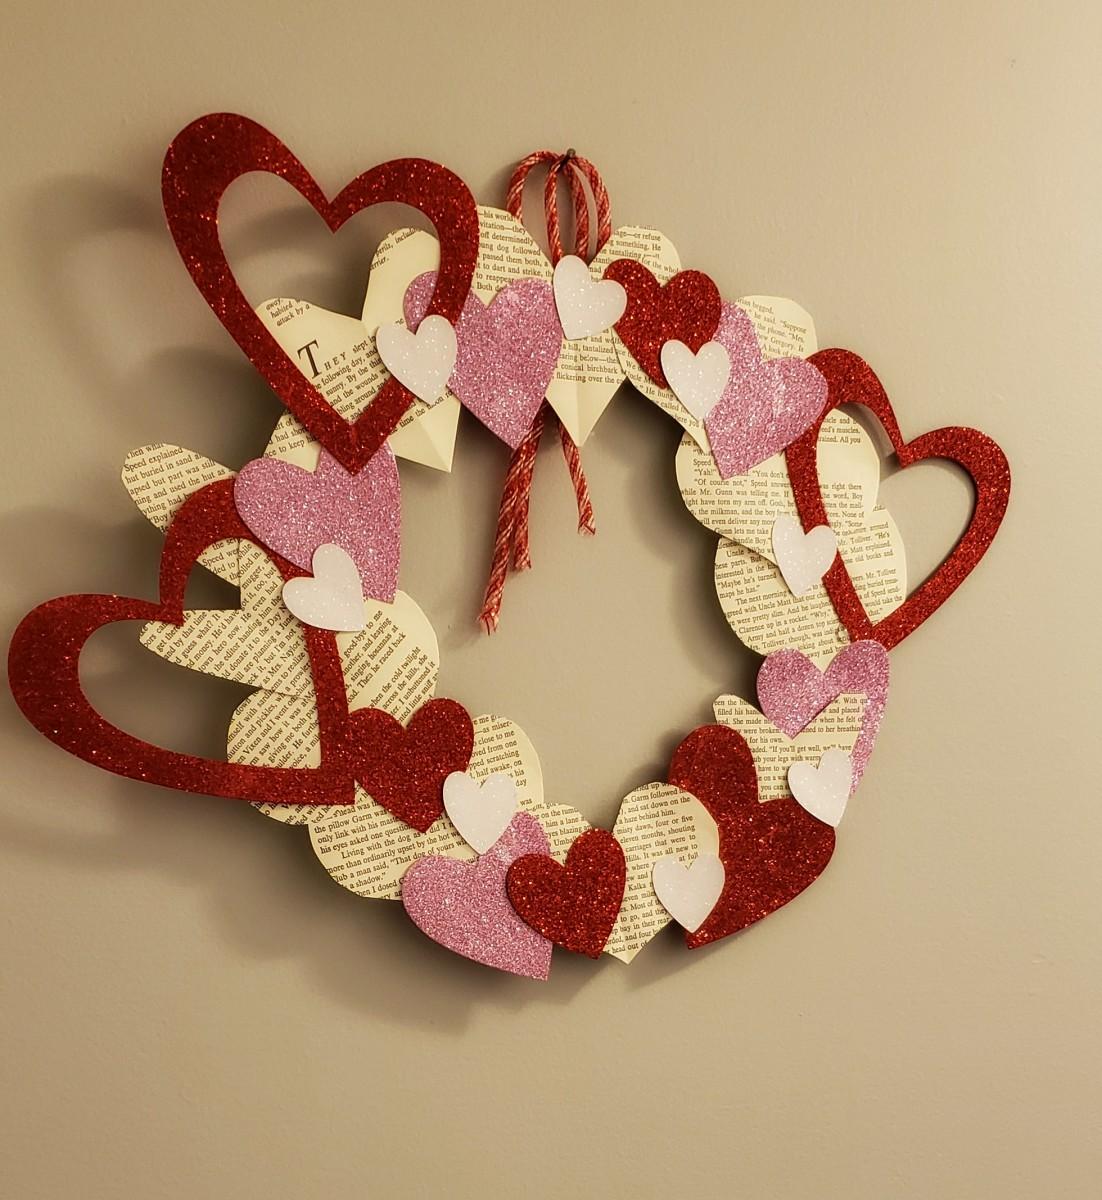 Beautiful glitter and paper heart wreath